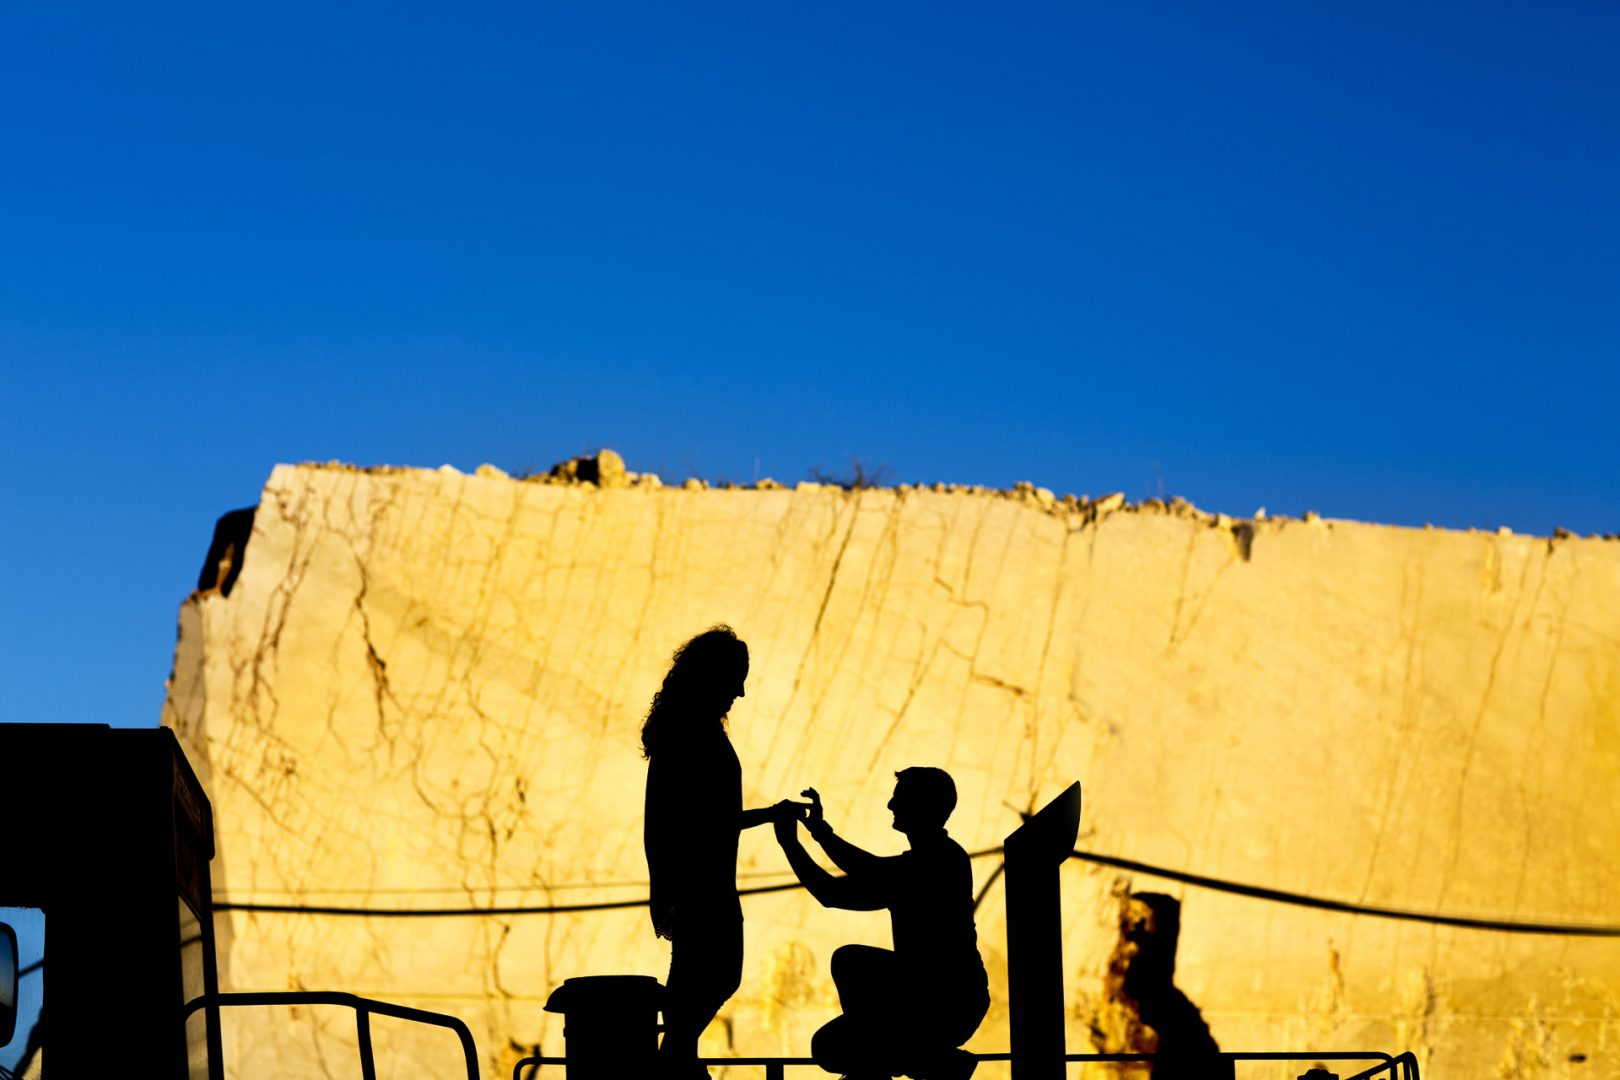 Sicily Engagement Proposal Photo Session By Nino Lombardo Photographer in Custonaci